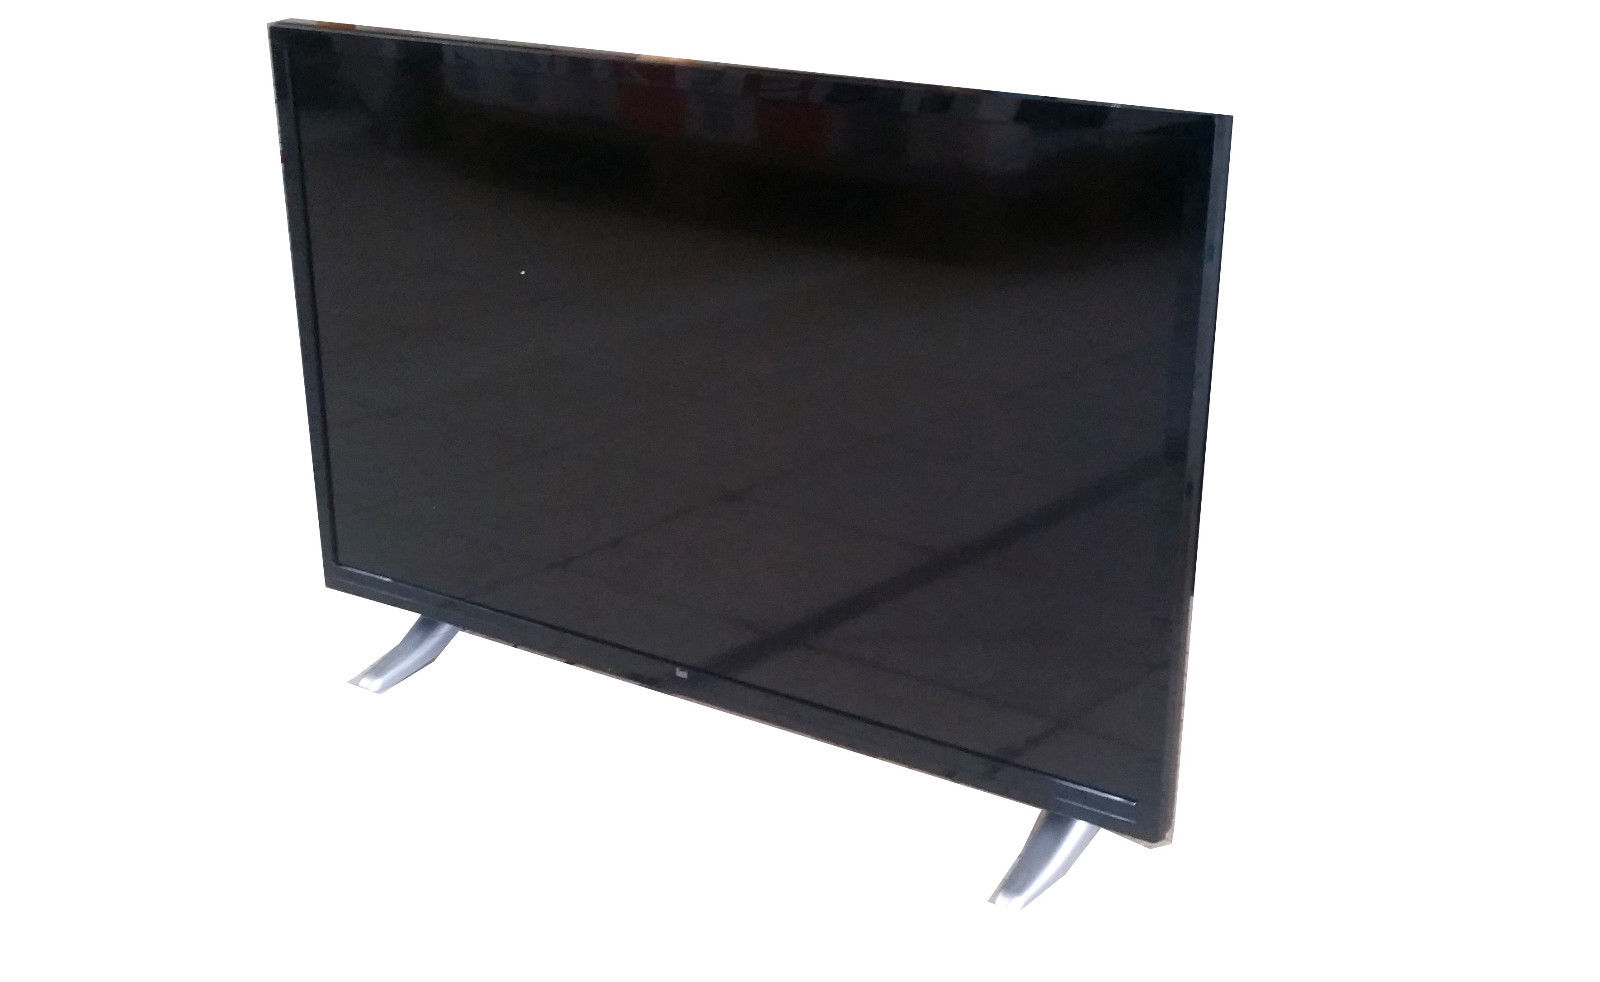 Dual TV Fernseher OVP 32